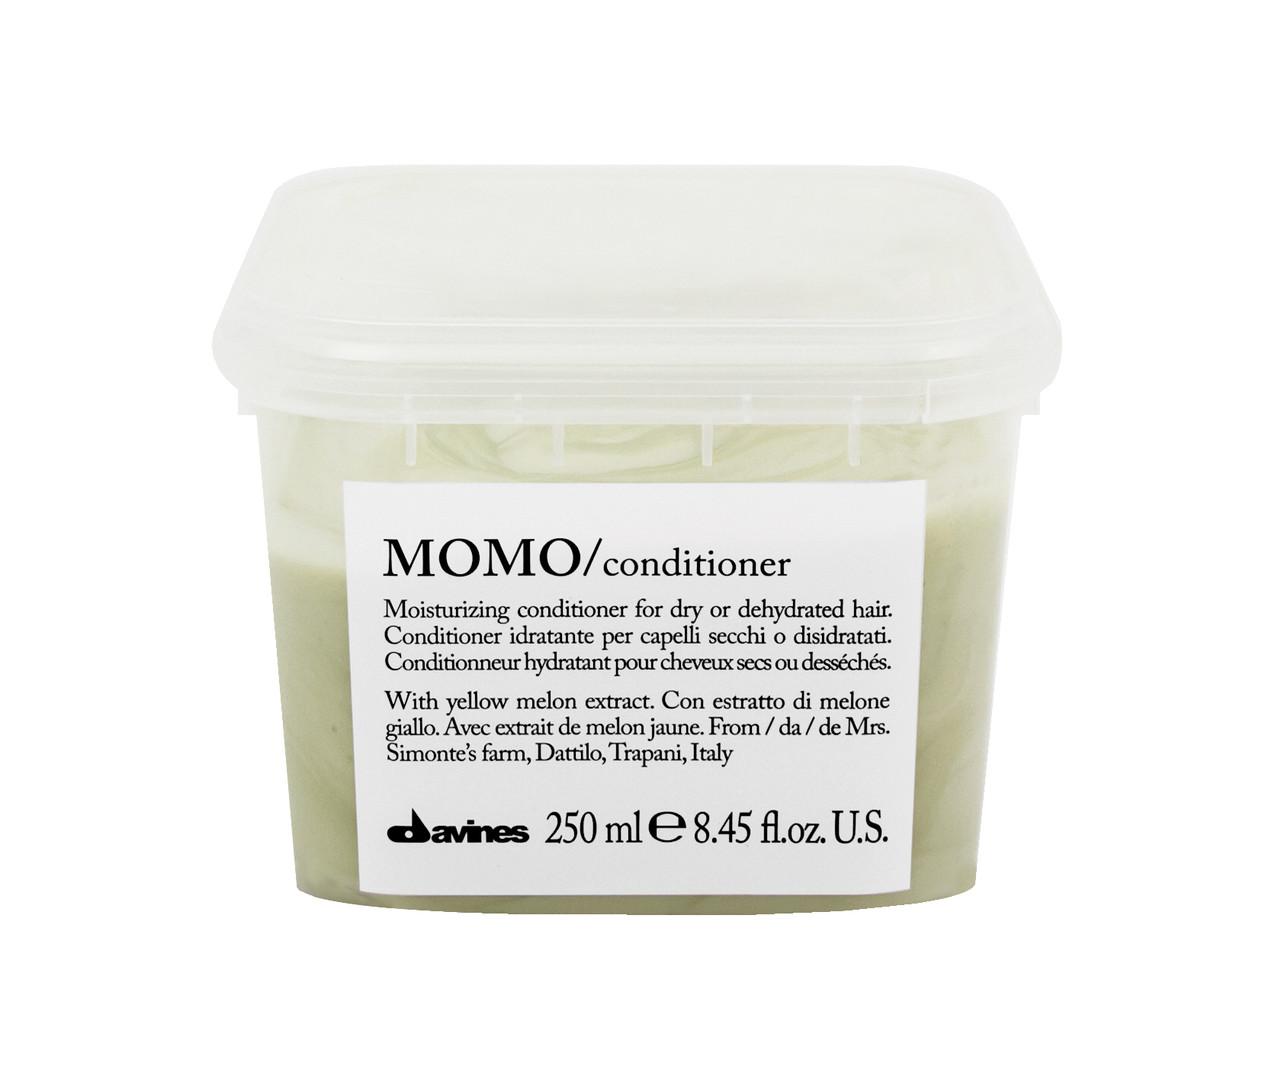 ech-momo-conditioner.jpg